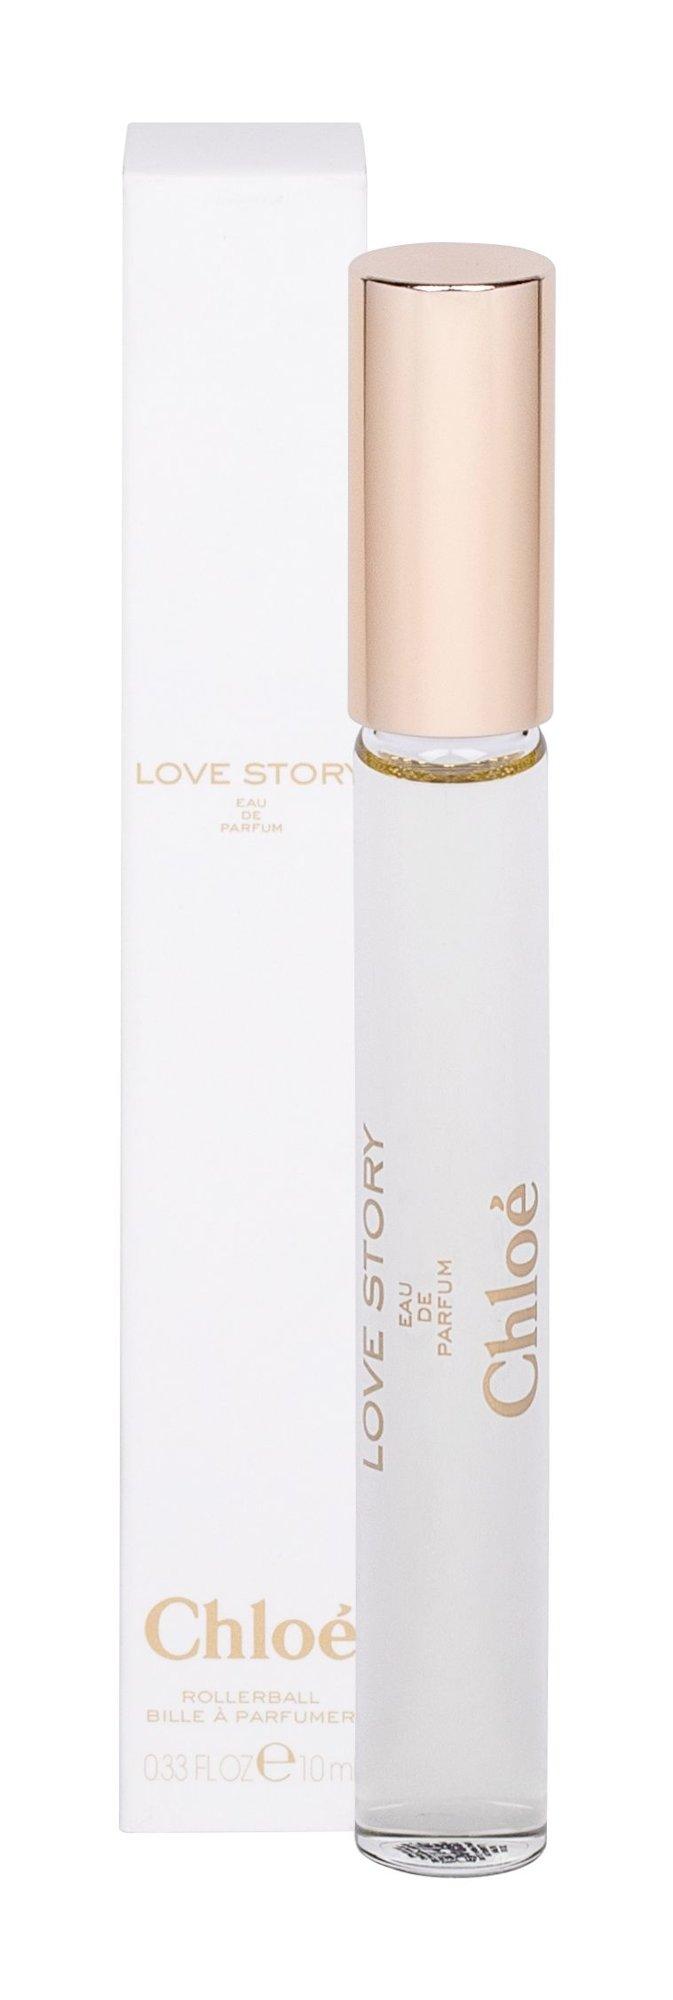 Chloé Love Story, edp 5ml